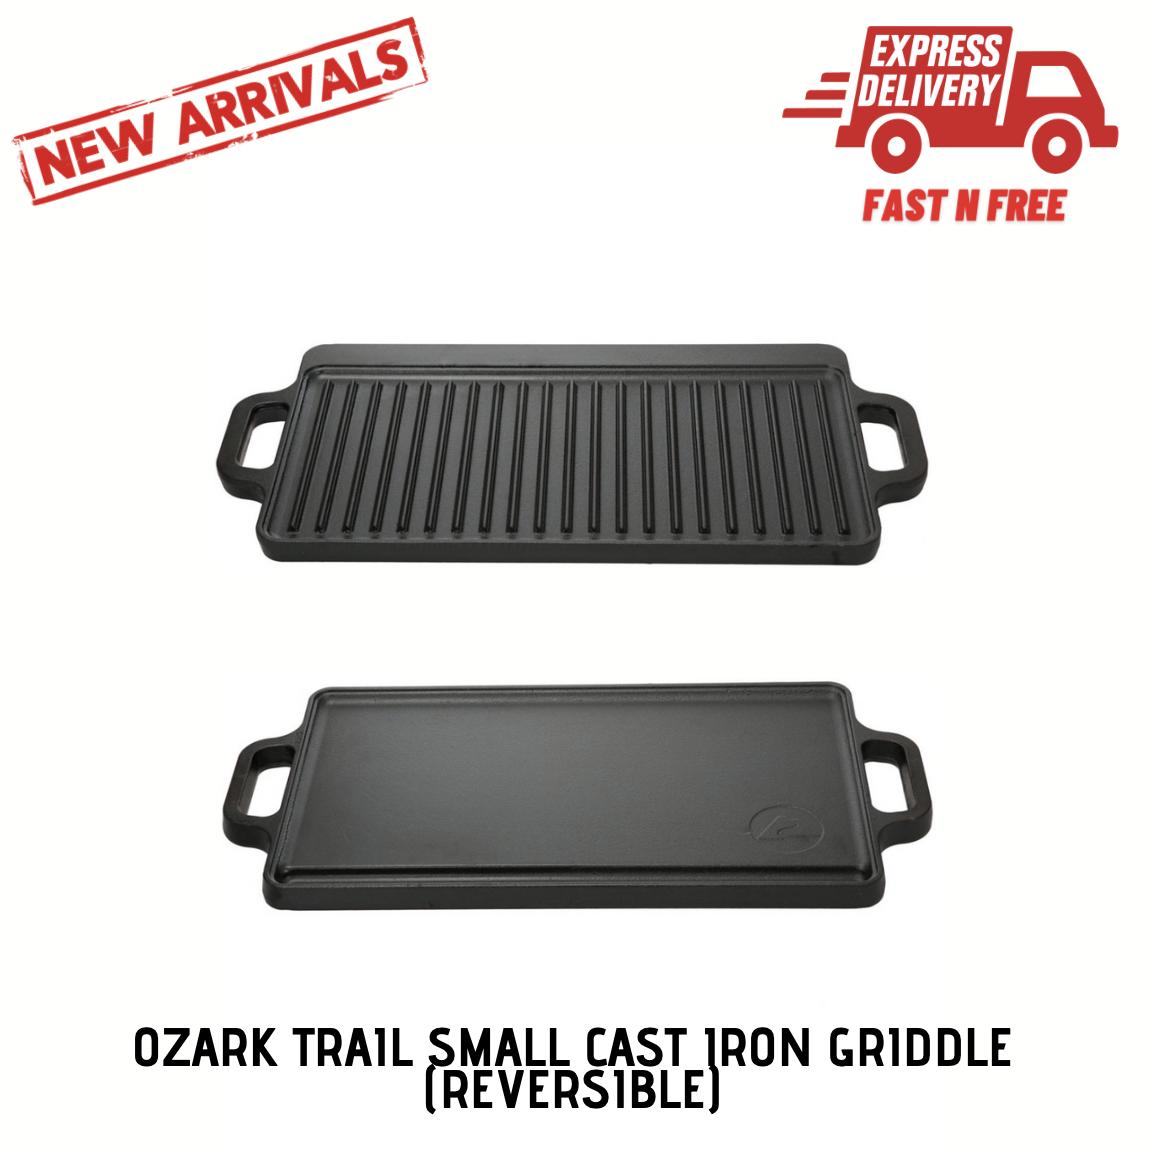 Cast Iron Reversible Grill Griddle 17 x 9 Pan Hamburger Stea